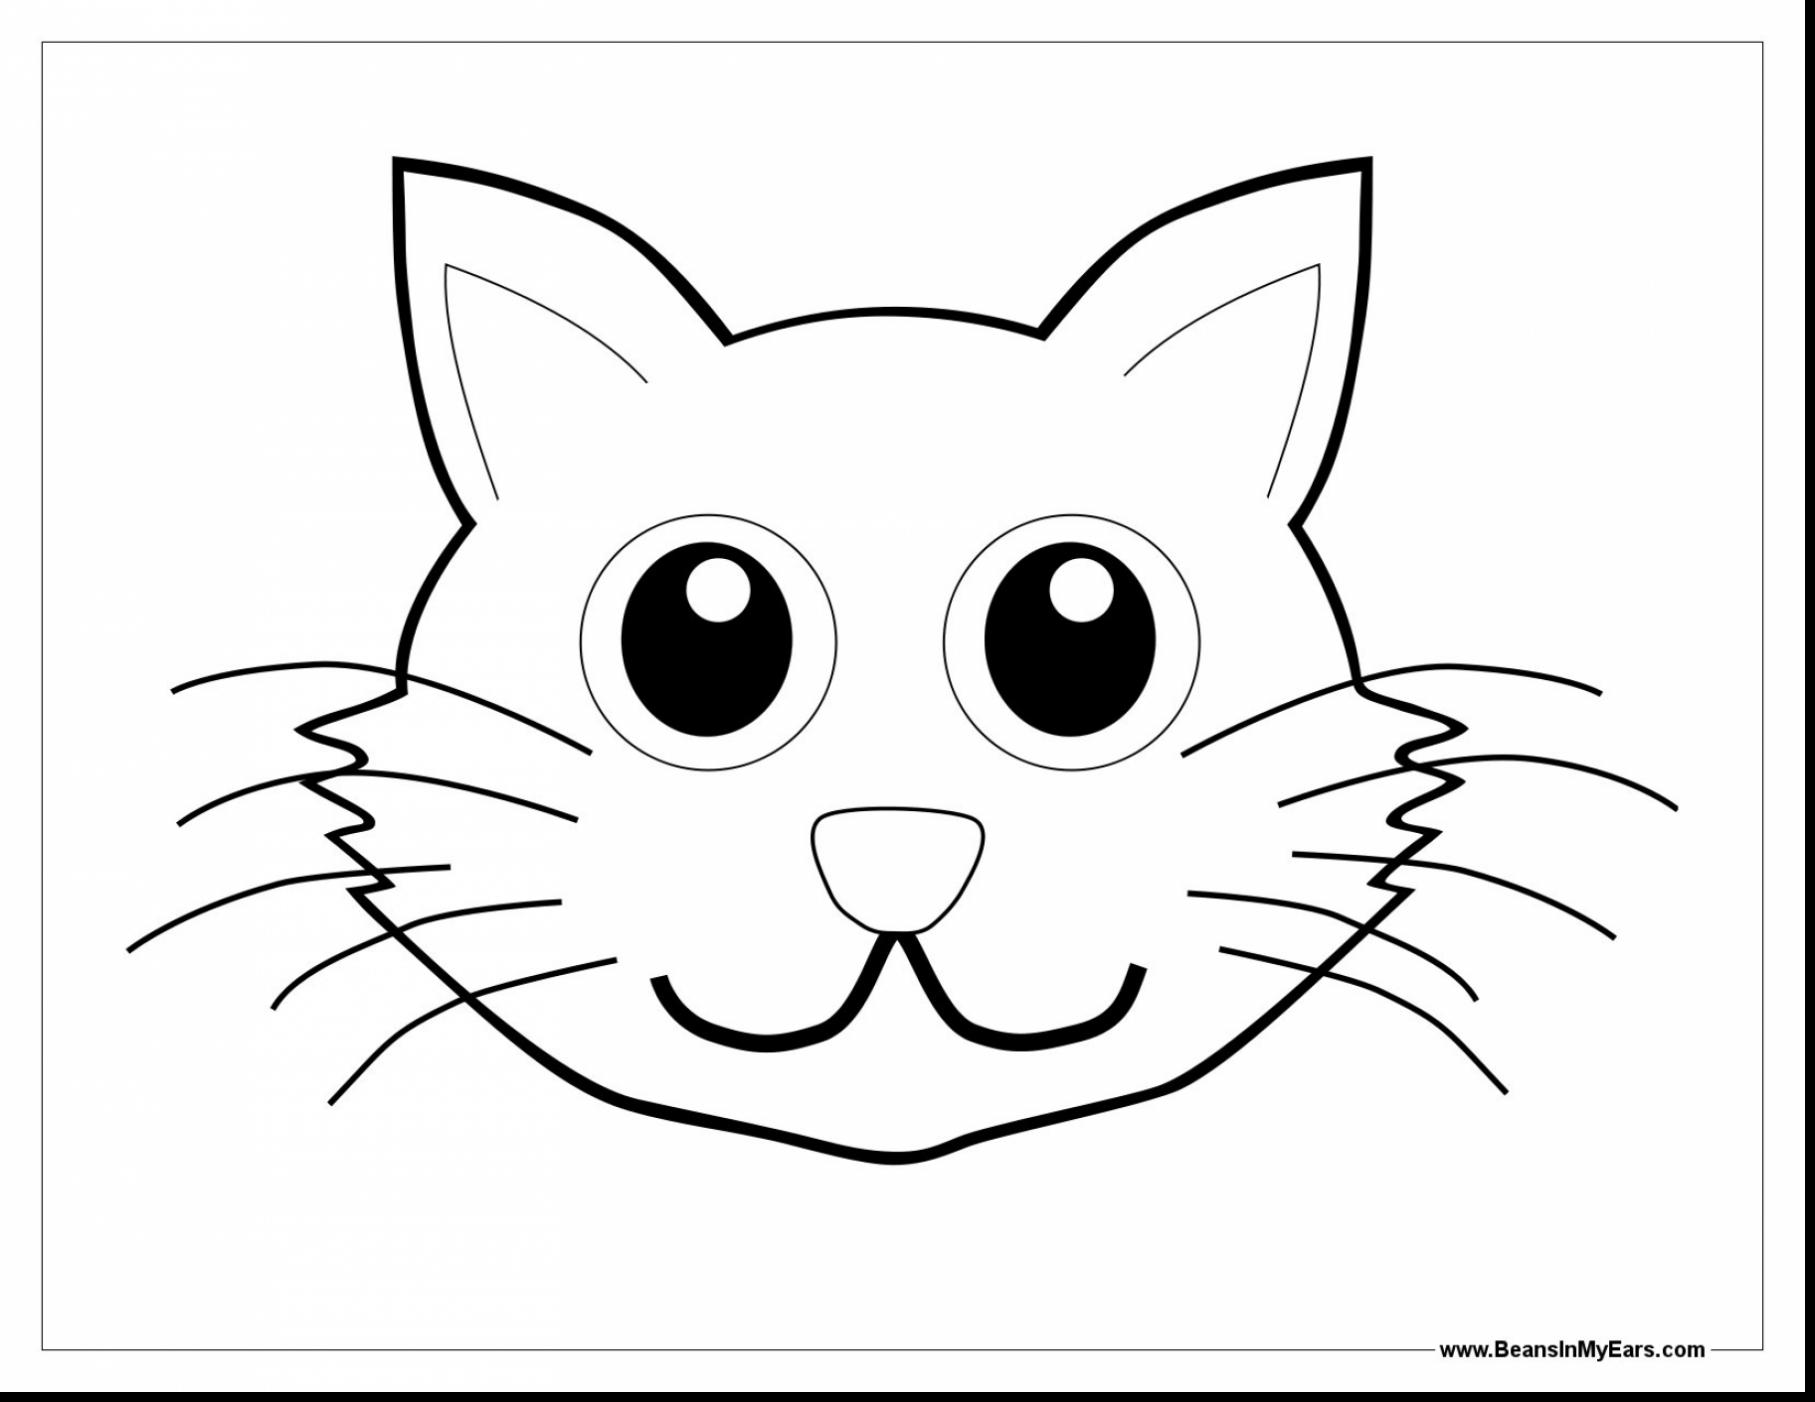 Cat Drawing Templates At Getdrawings